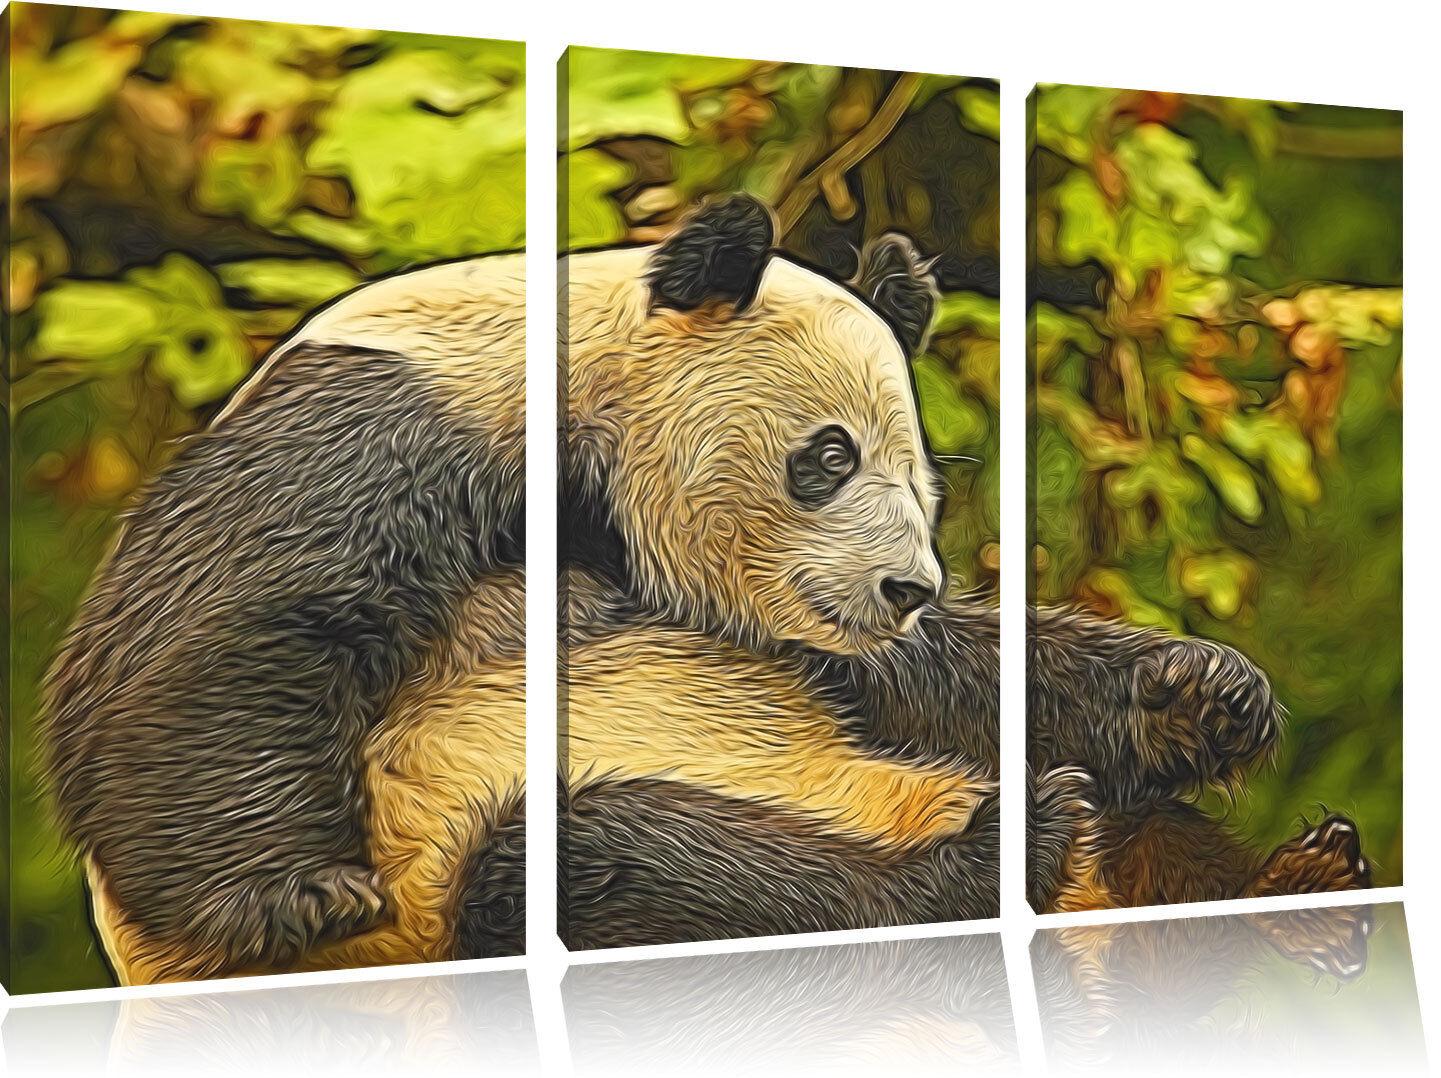 Carino Panda Newart 3-Teiler Quadro su Tel Decorazione Parete Stampa Artistica